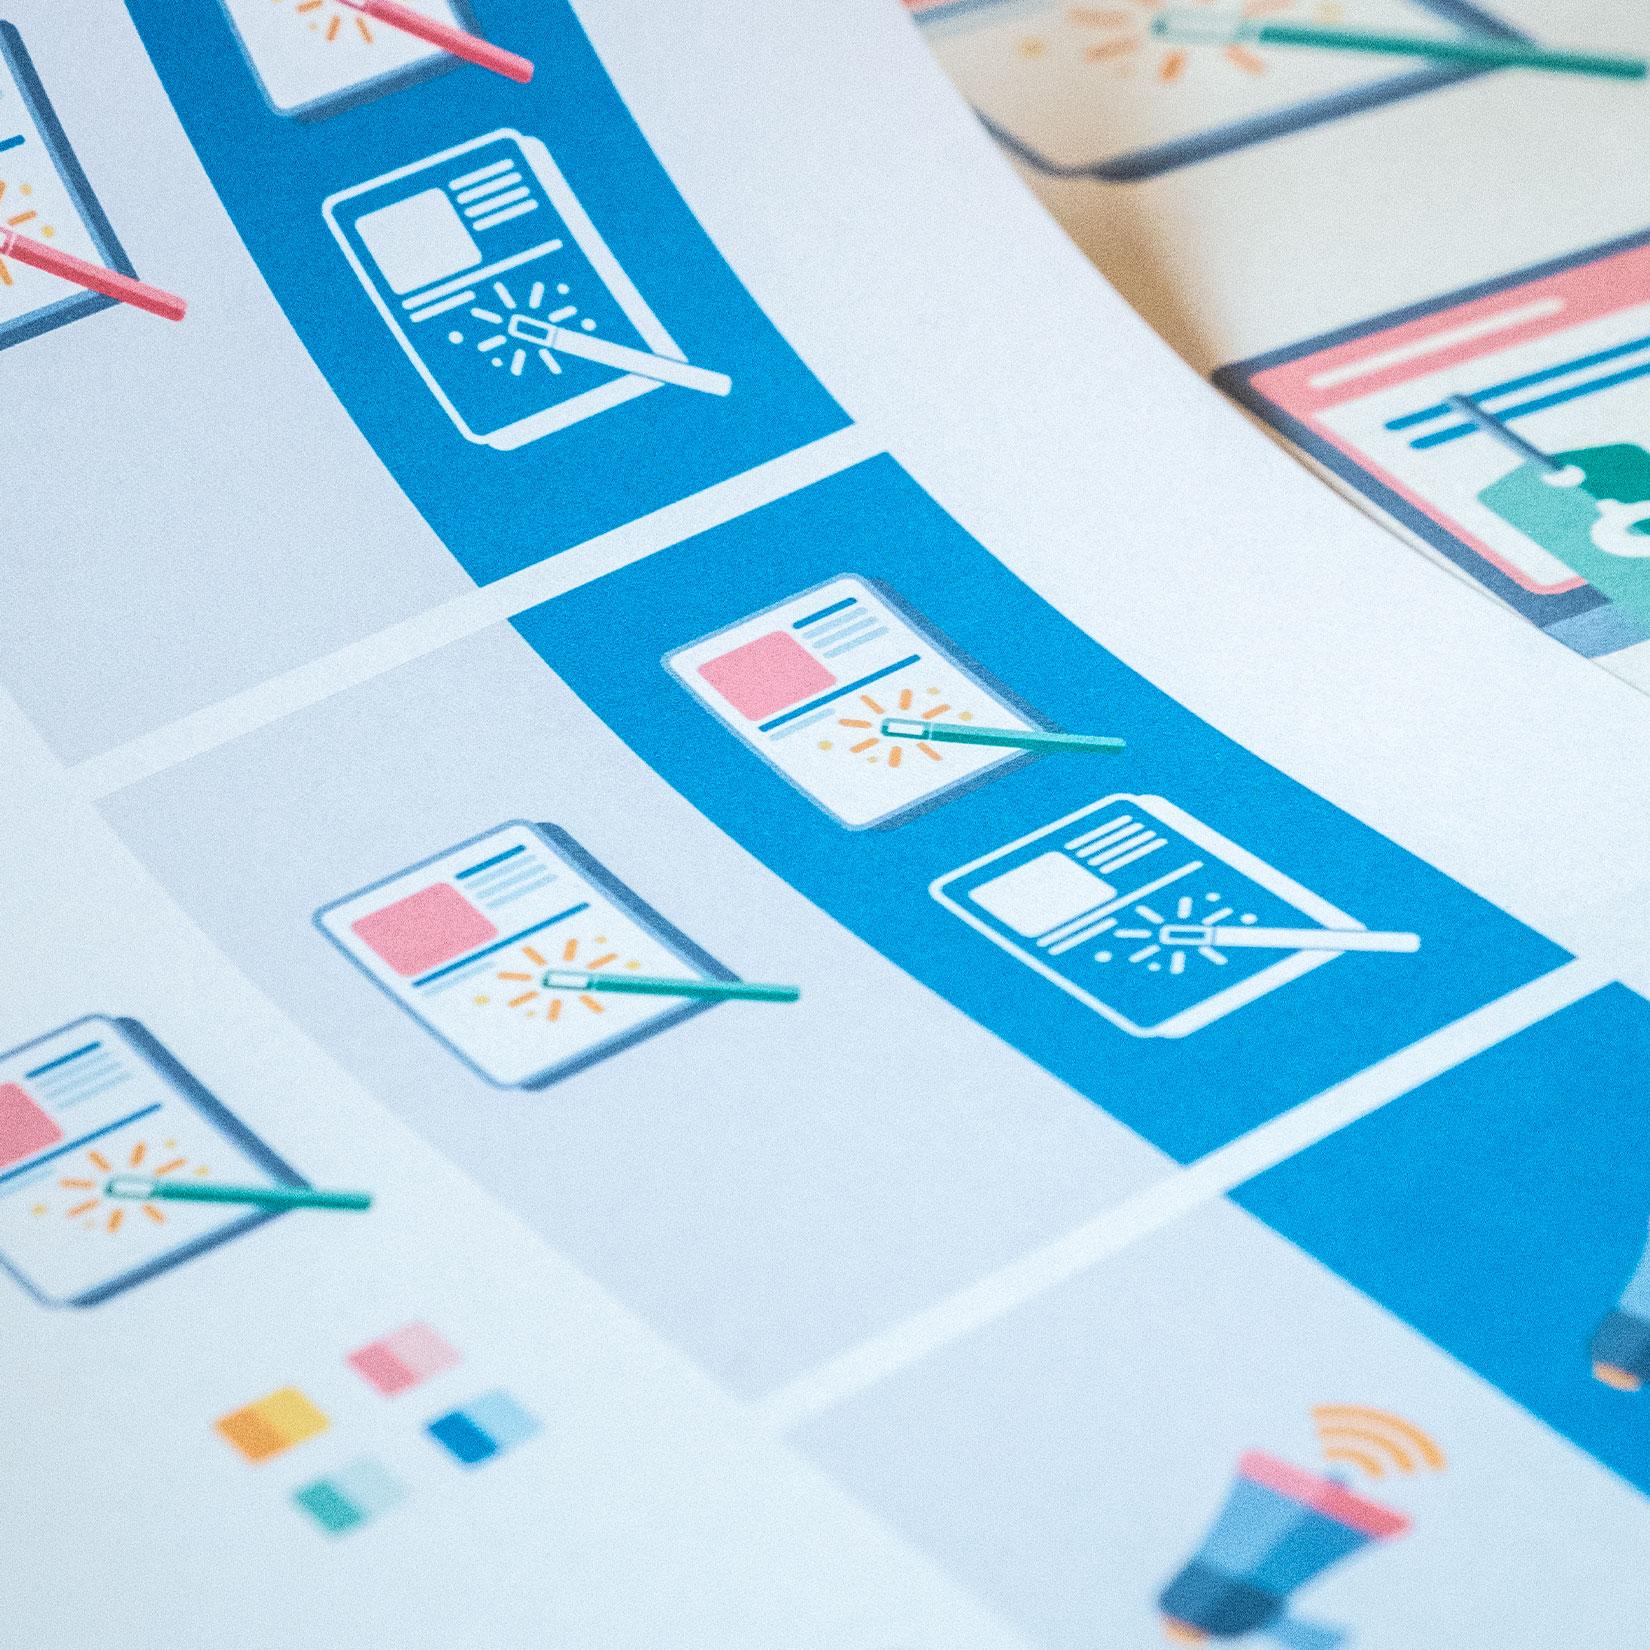 Eology Corporate Design Iconevolution